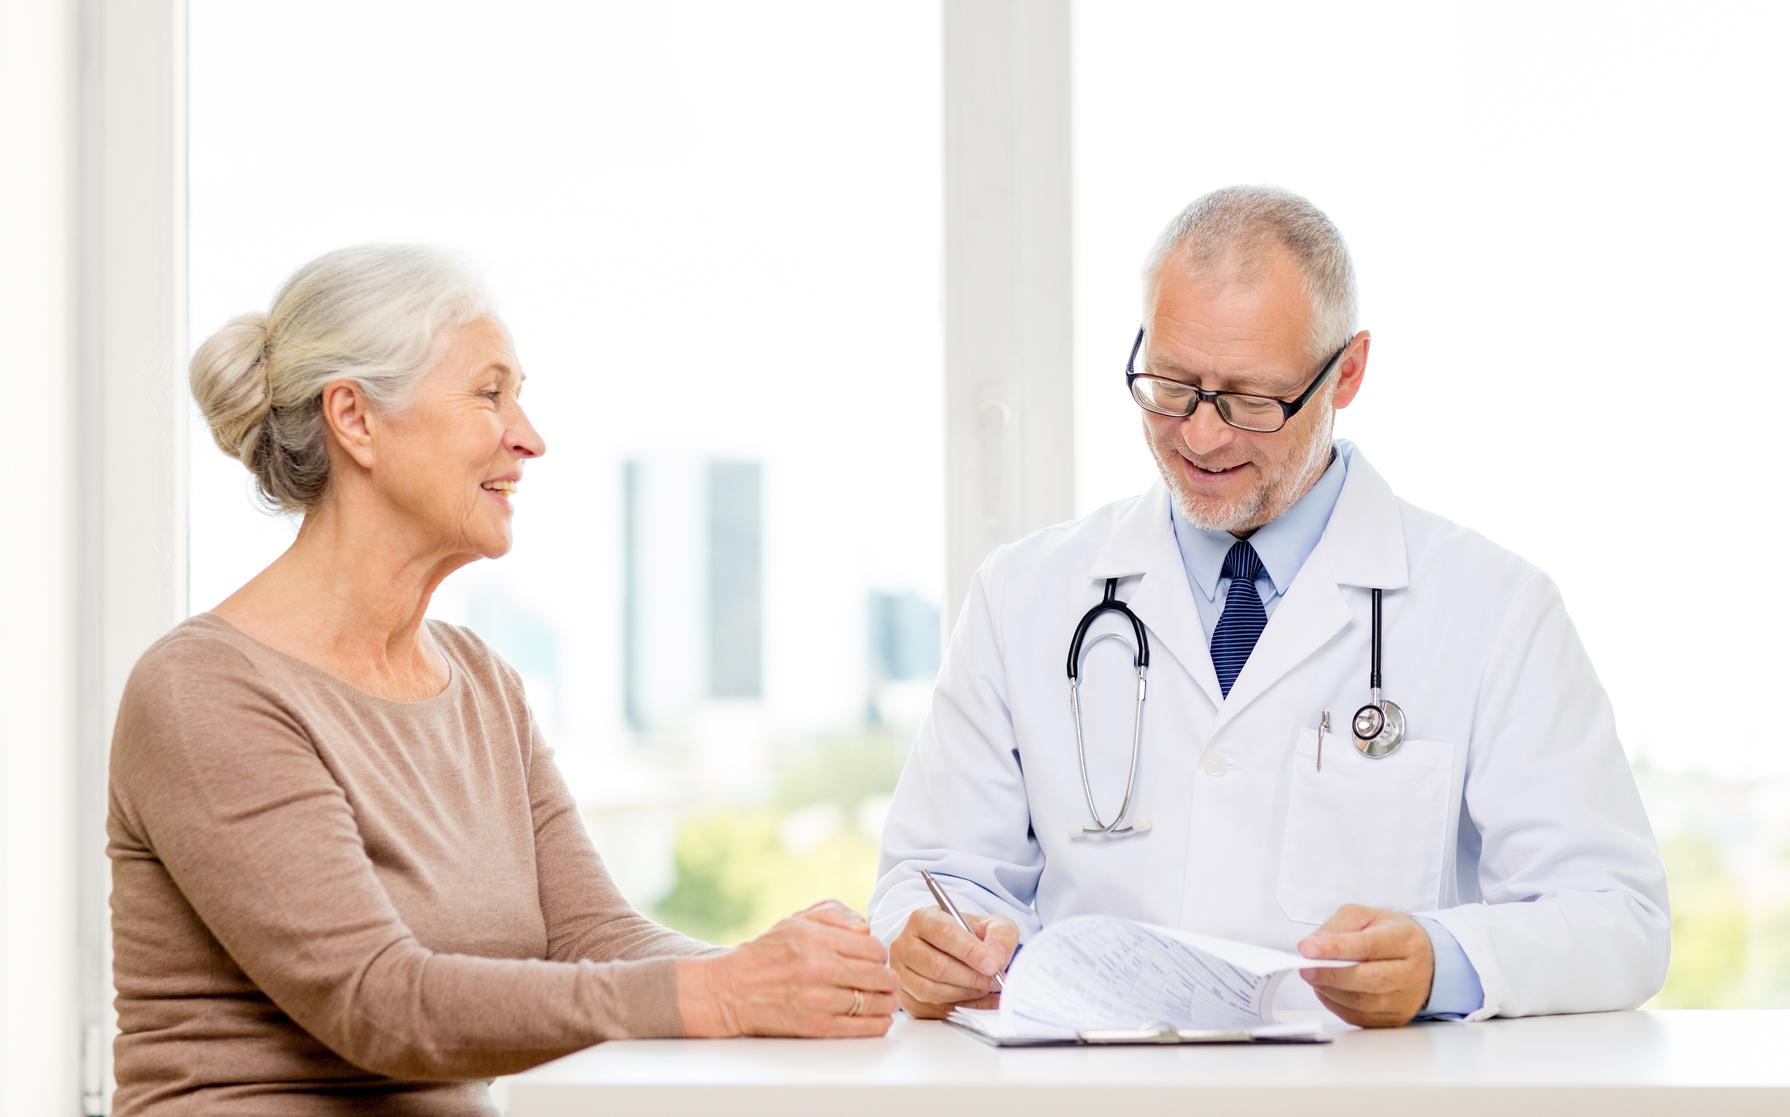 Консультация и советы от доктора нарколога в клинике